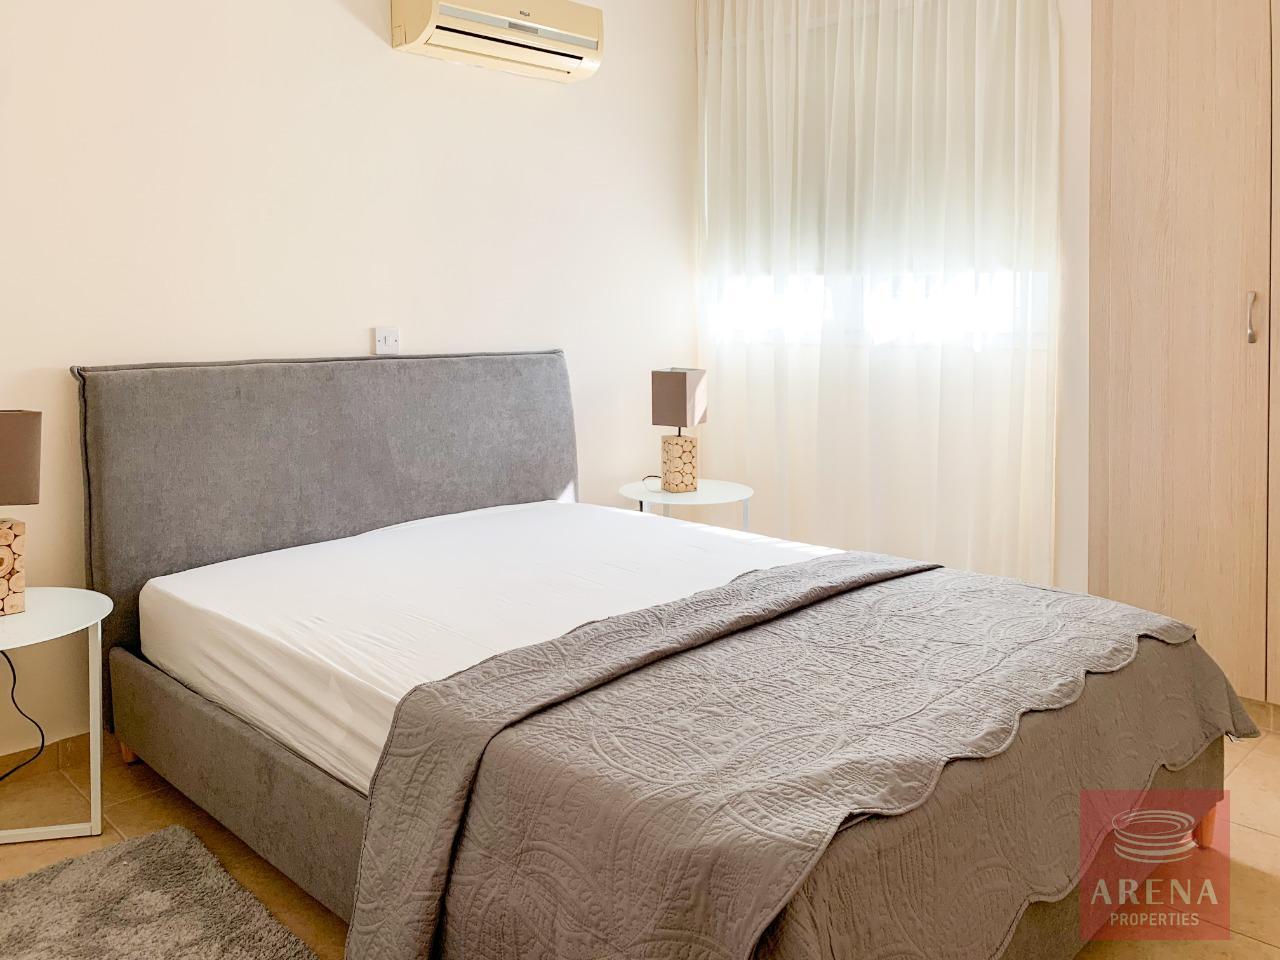 Apt for sale in Larnaca - bedroom